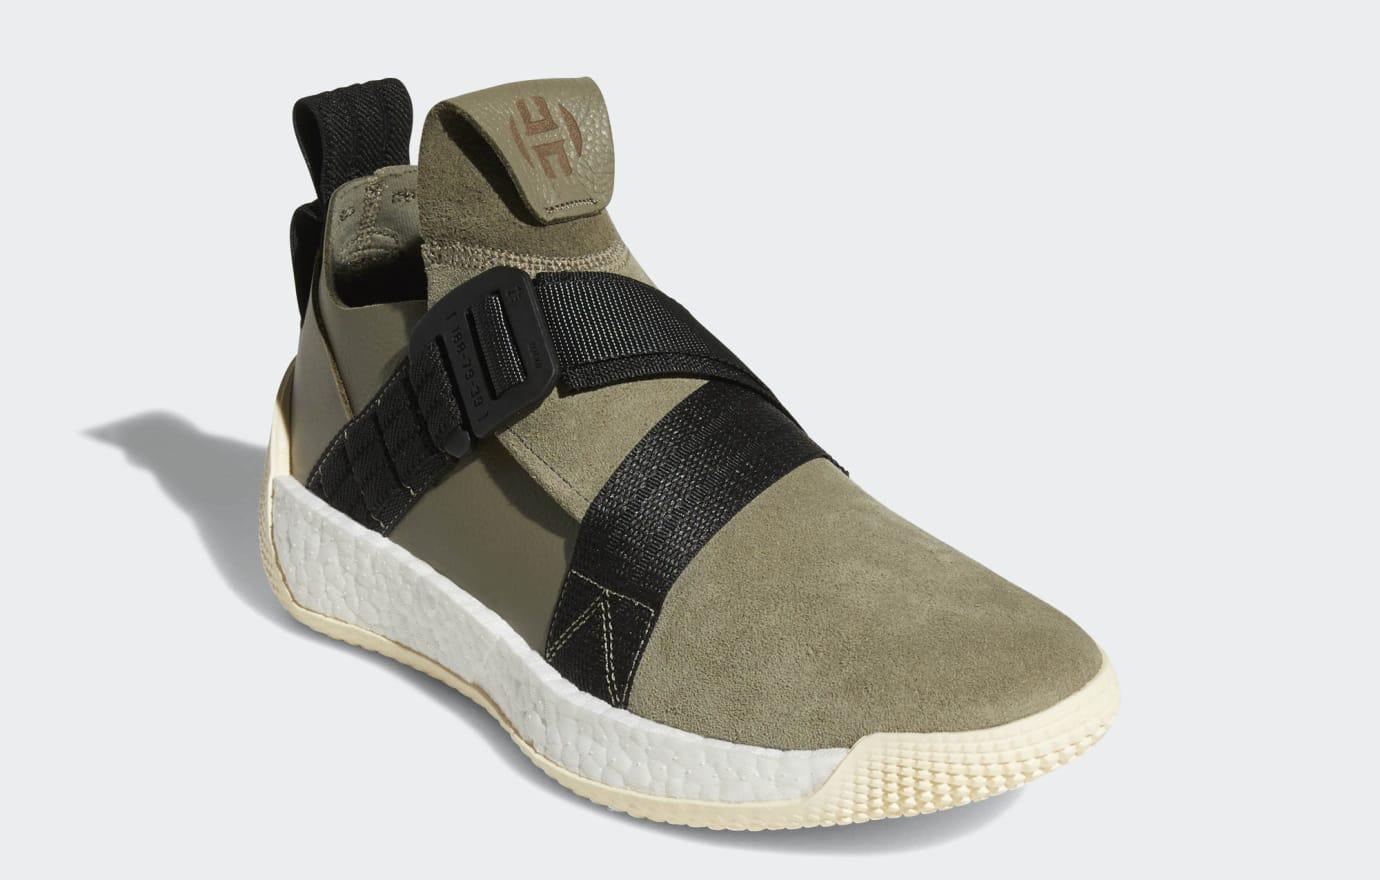 9ba99ea8347 Adidas Harden LS 2 Buckle  Black   Olive   Brown  Release Date ...